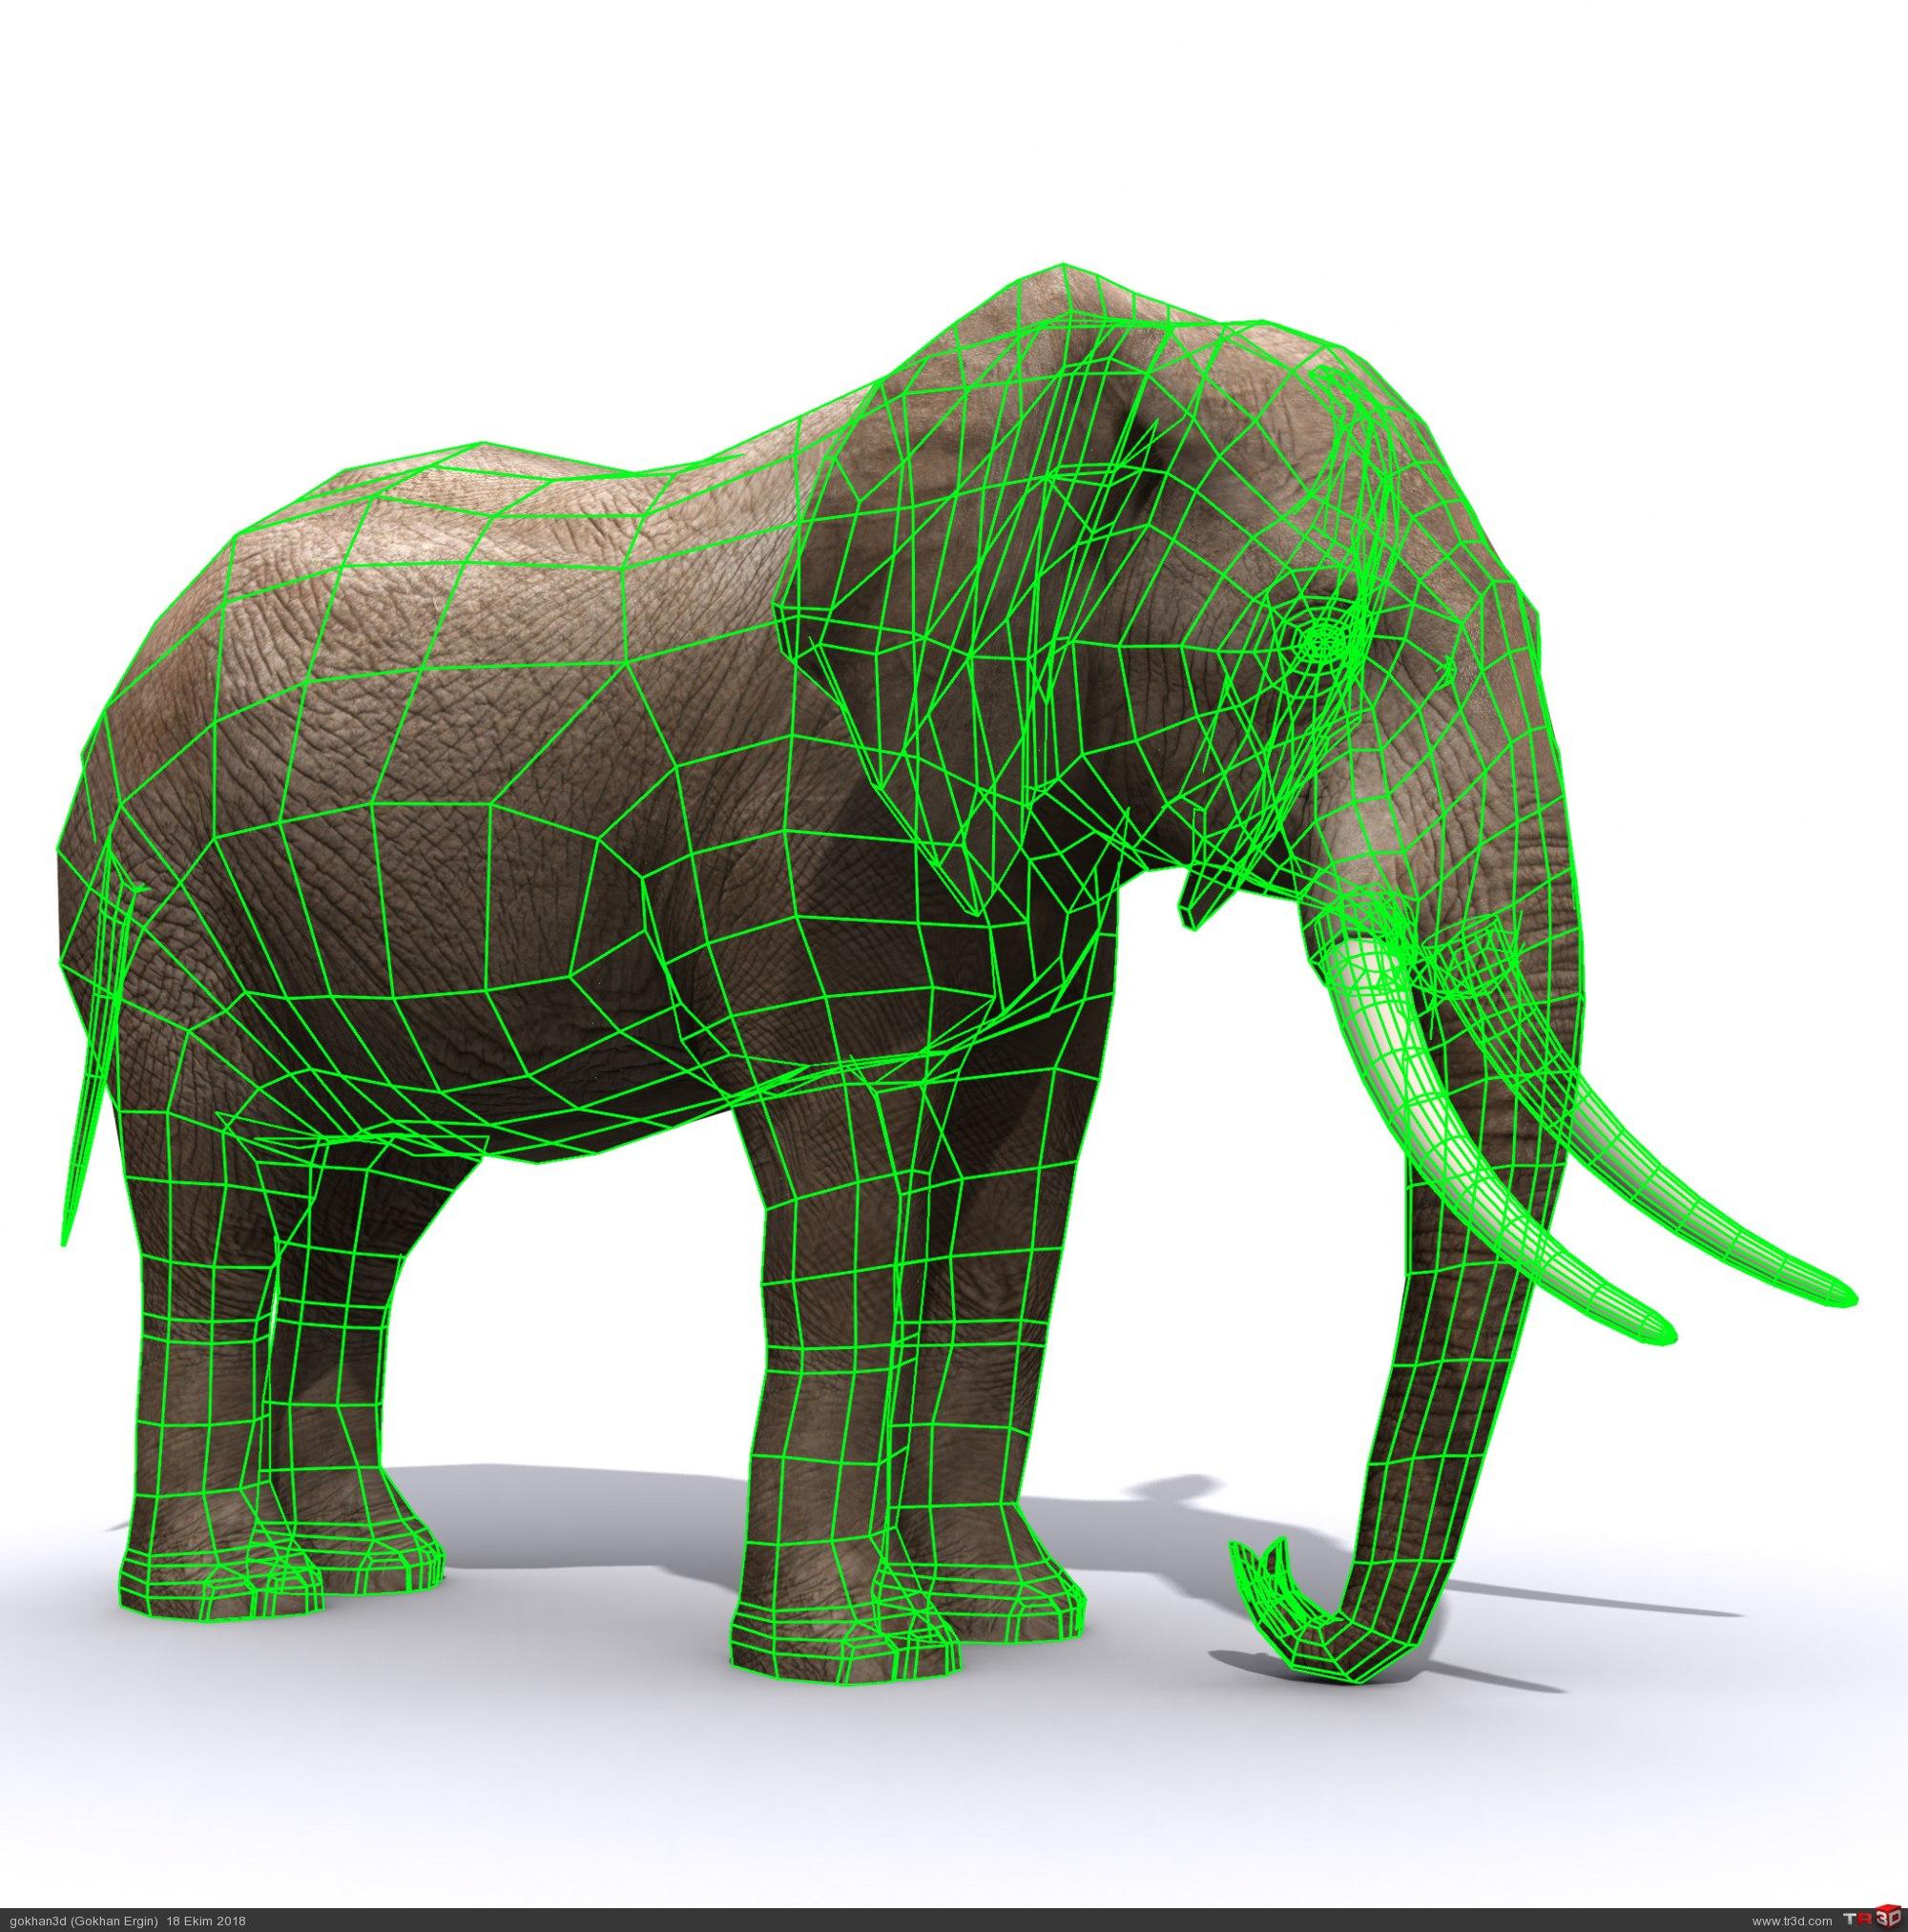 Fil ücretsiz model 1